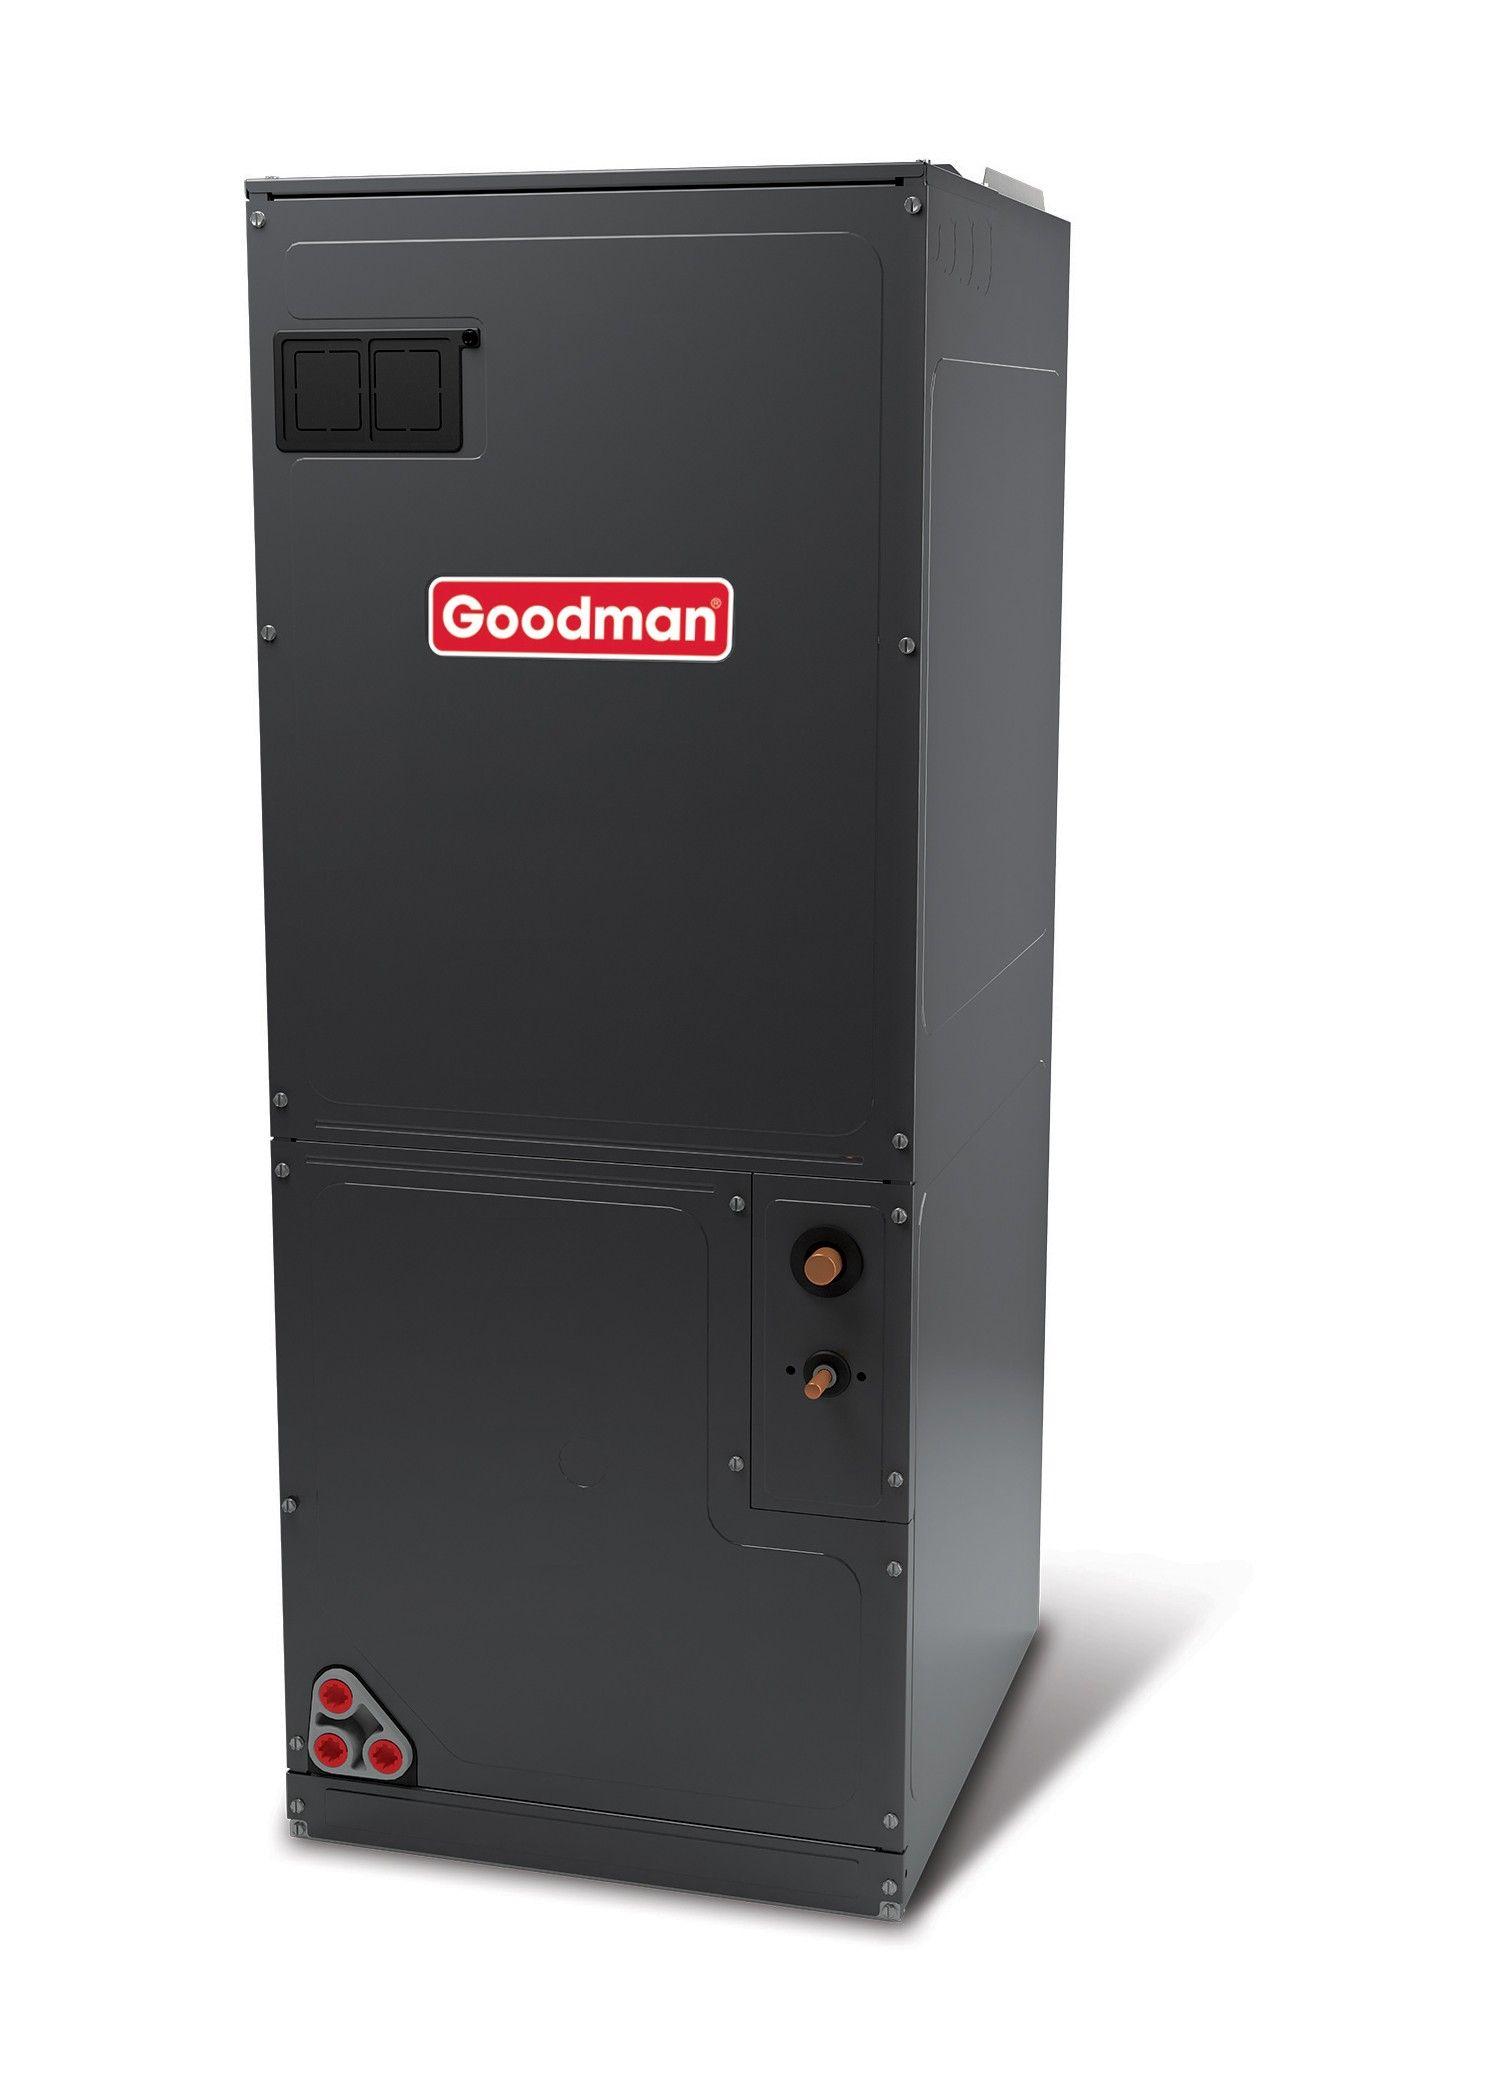 goodman furnace parts diagram obd0 to obd1 wiring bryant gas blower motor